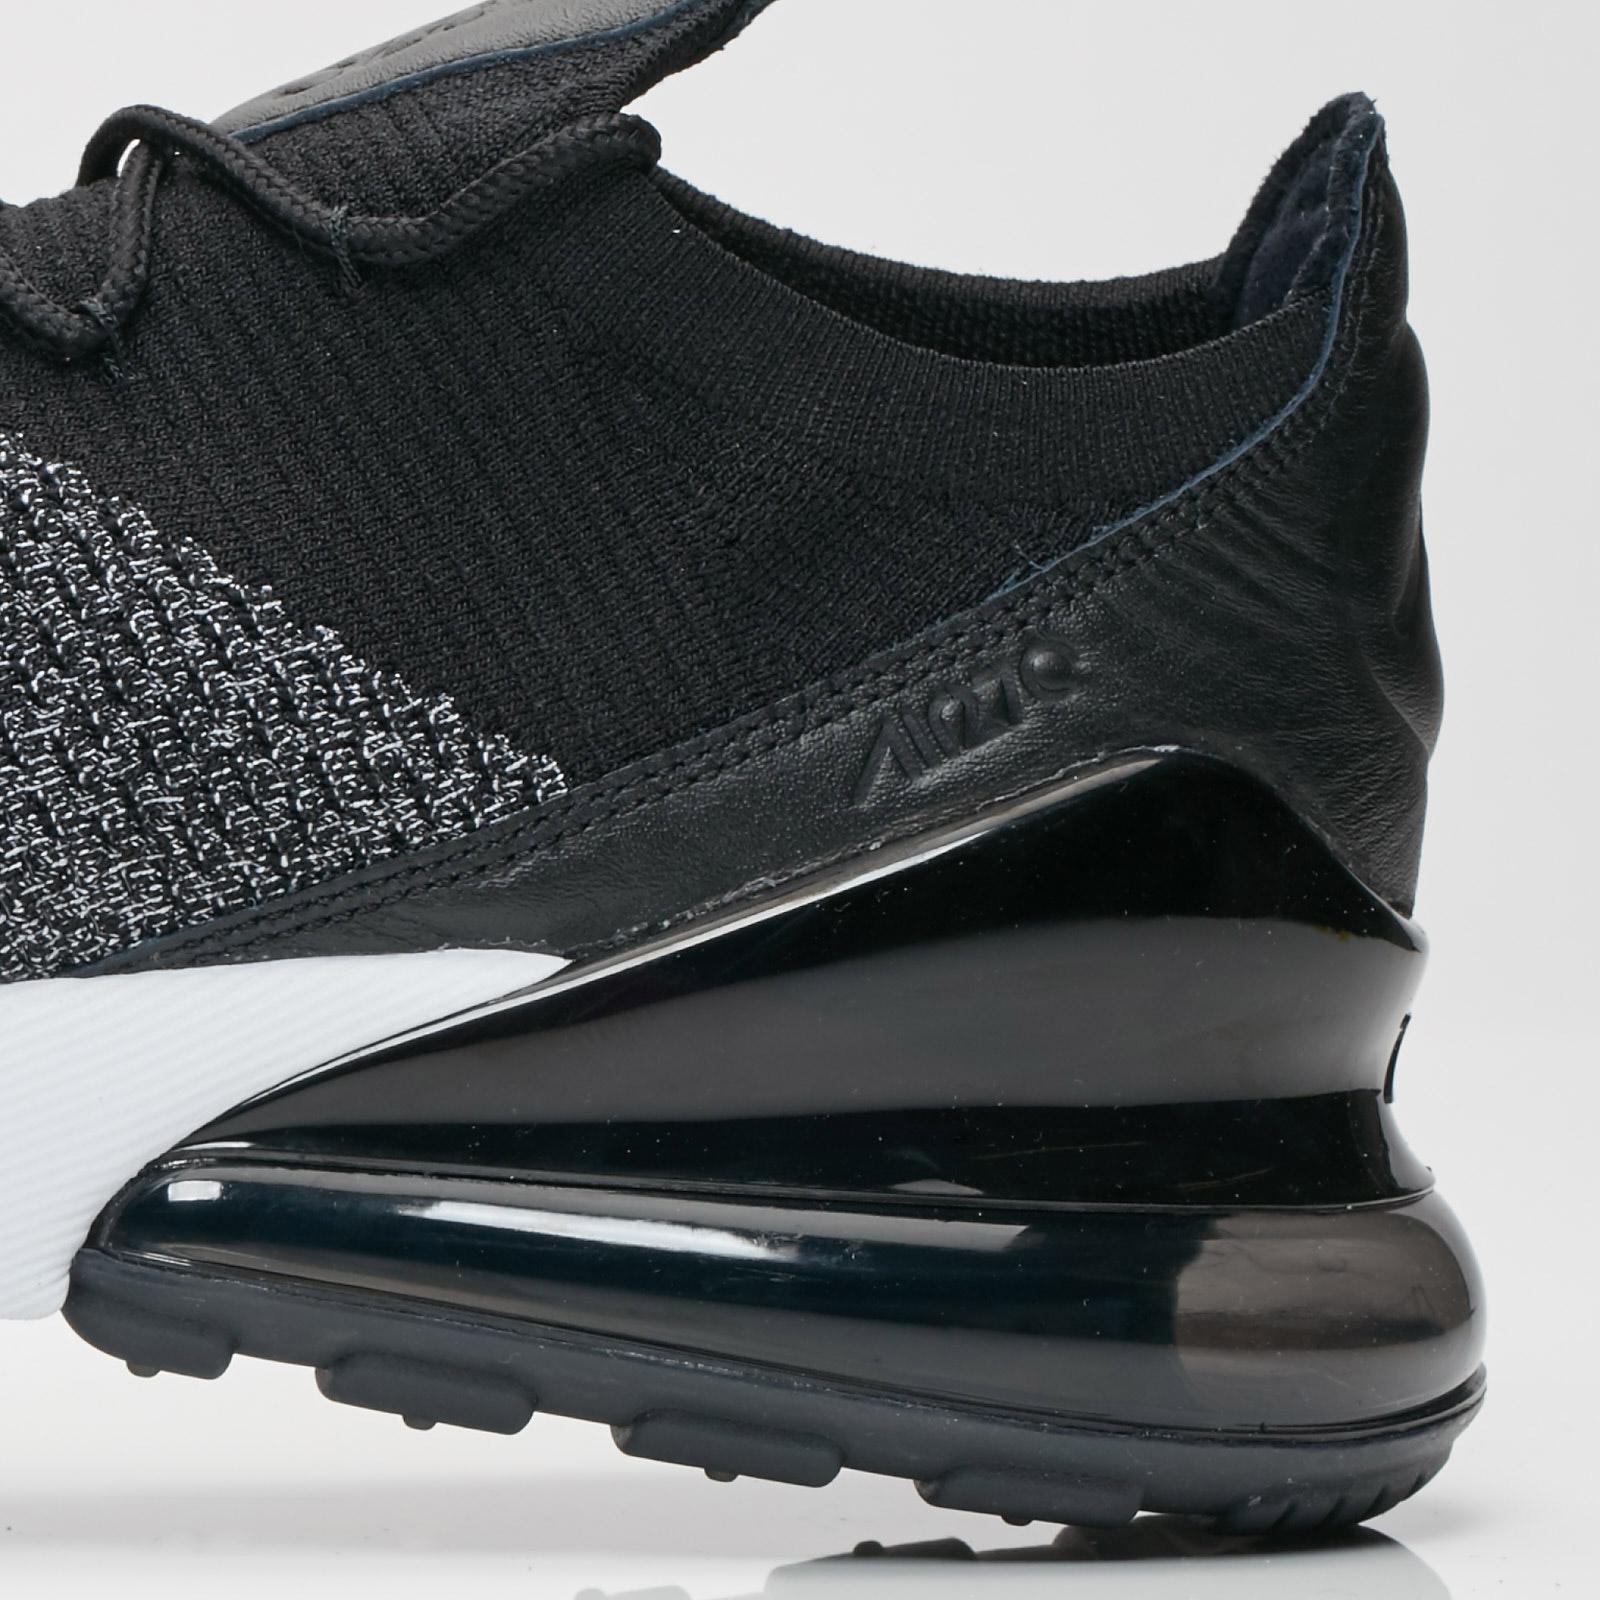 Nike Air Max 270 Flyknit - Ao1023-001 - Sneakersnstuff  5b16f1109